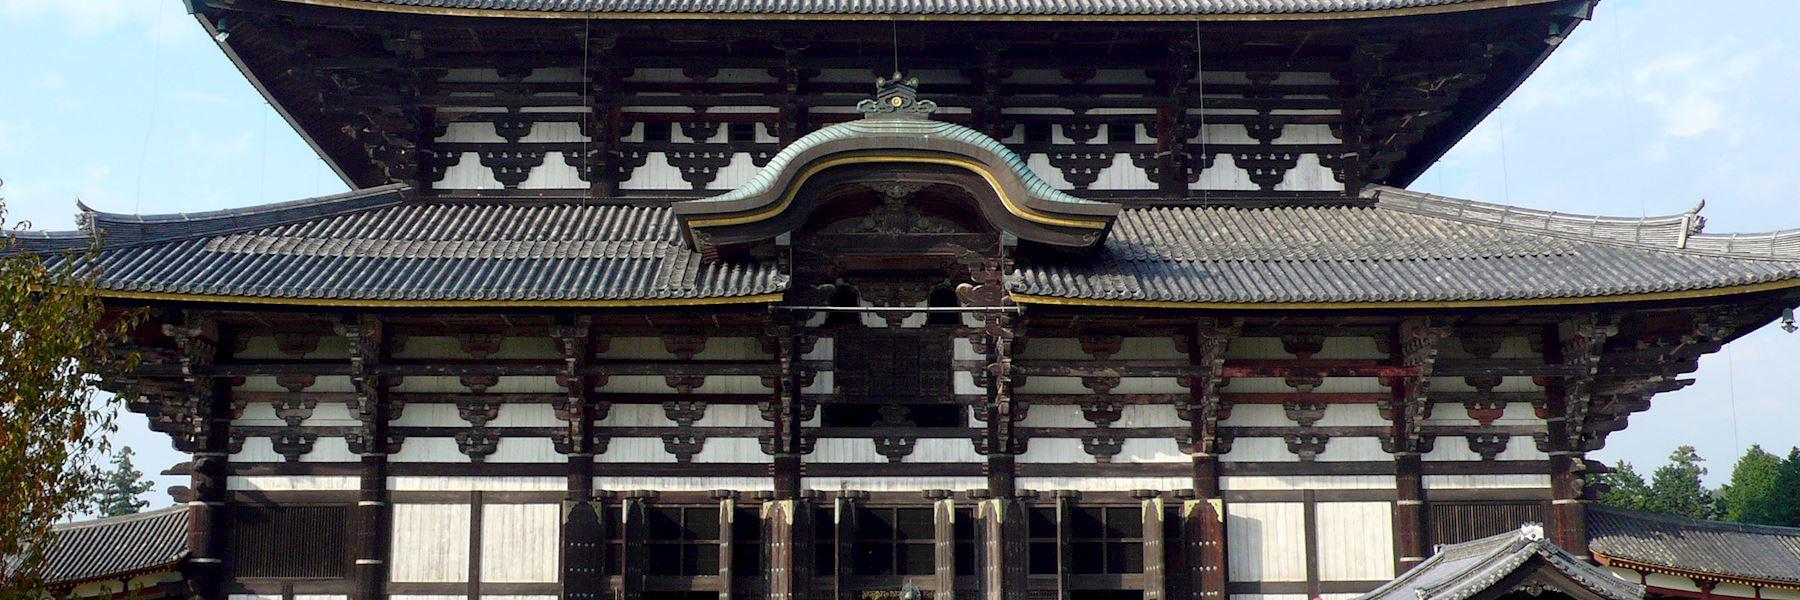 Visit Nara, Japan